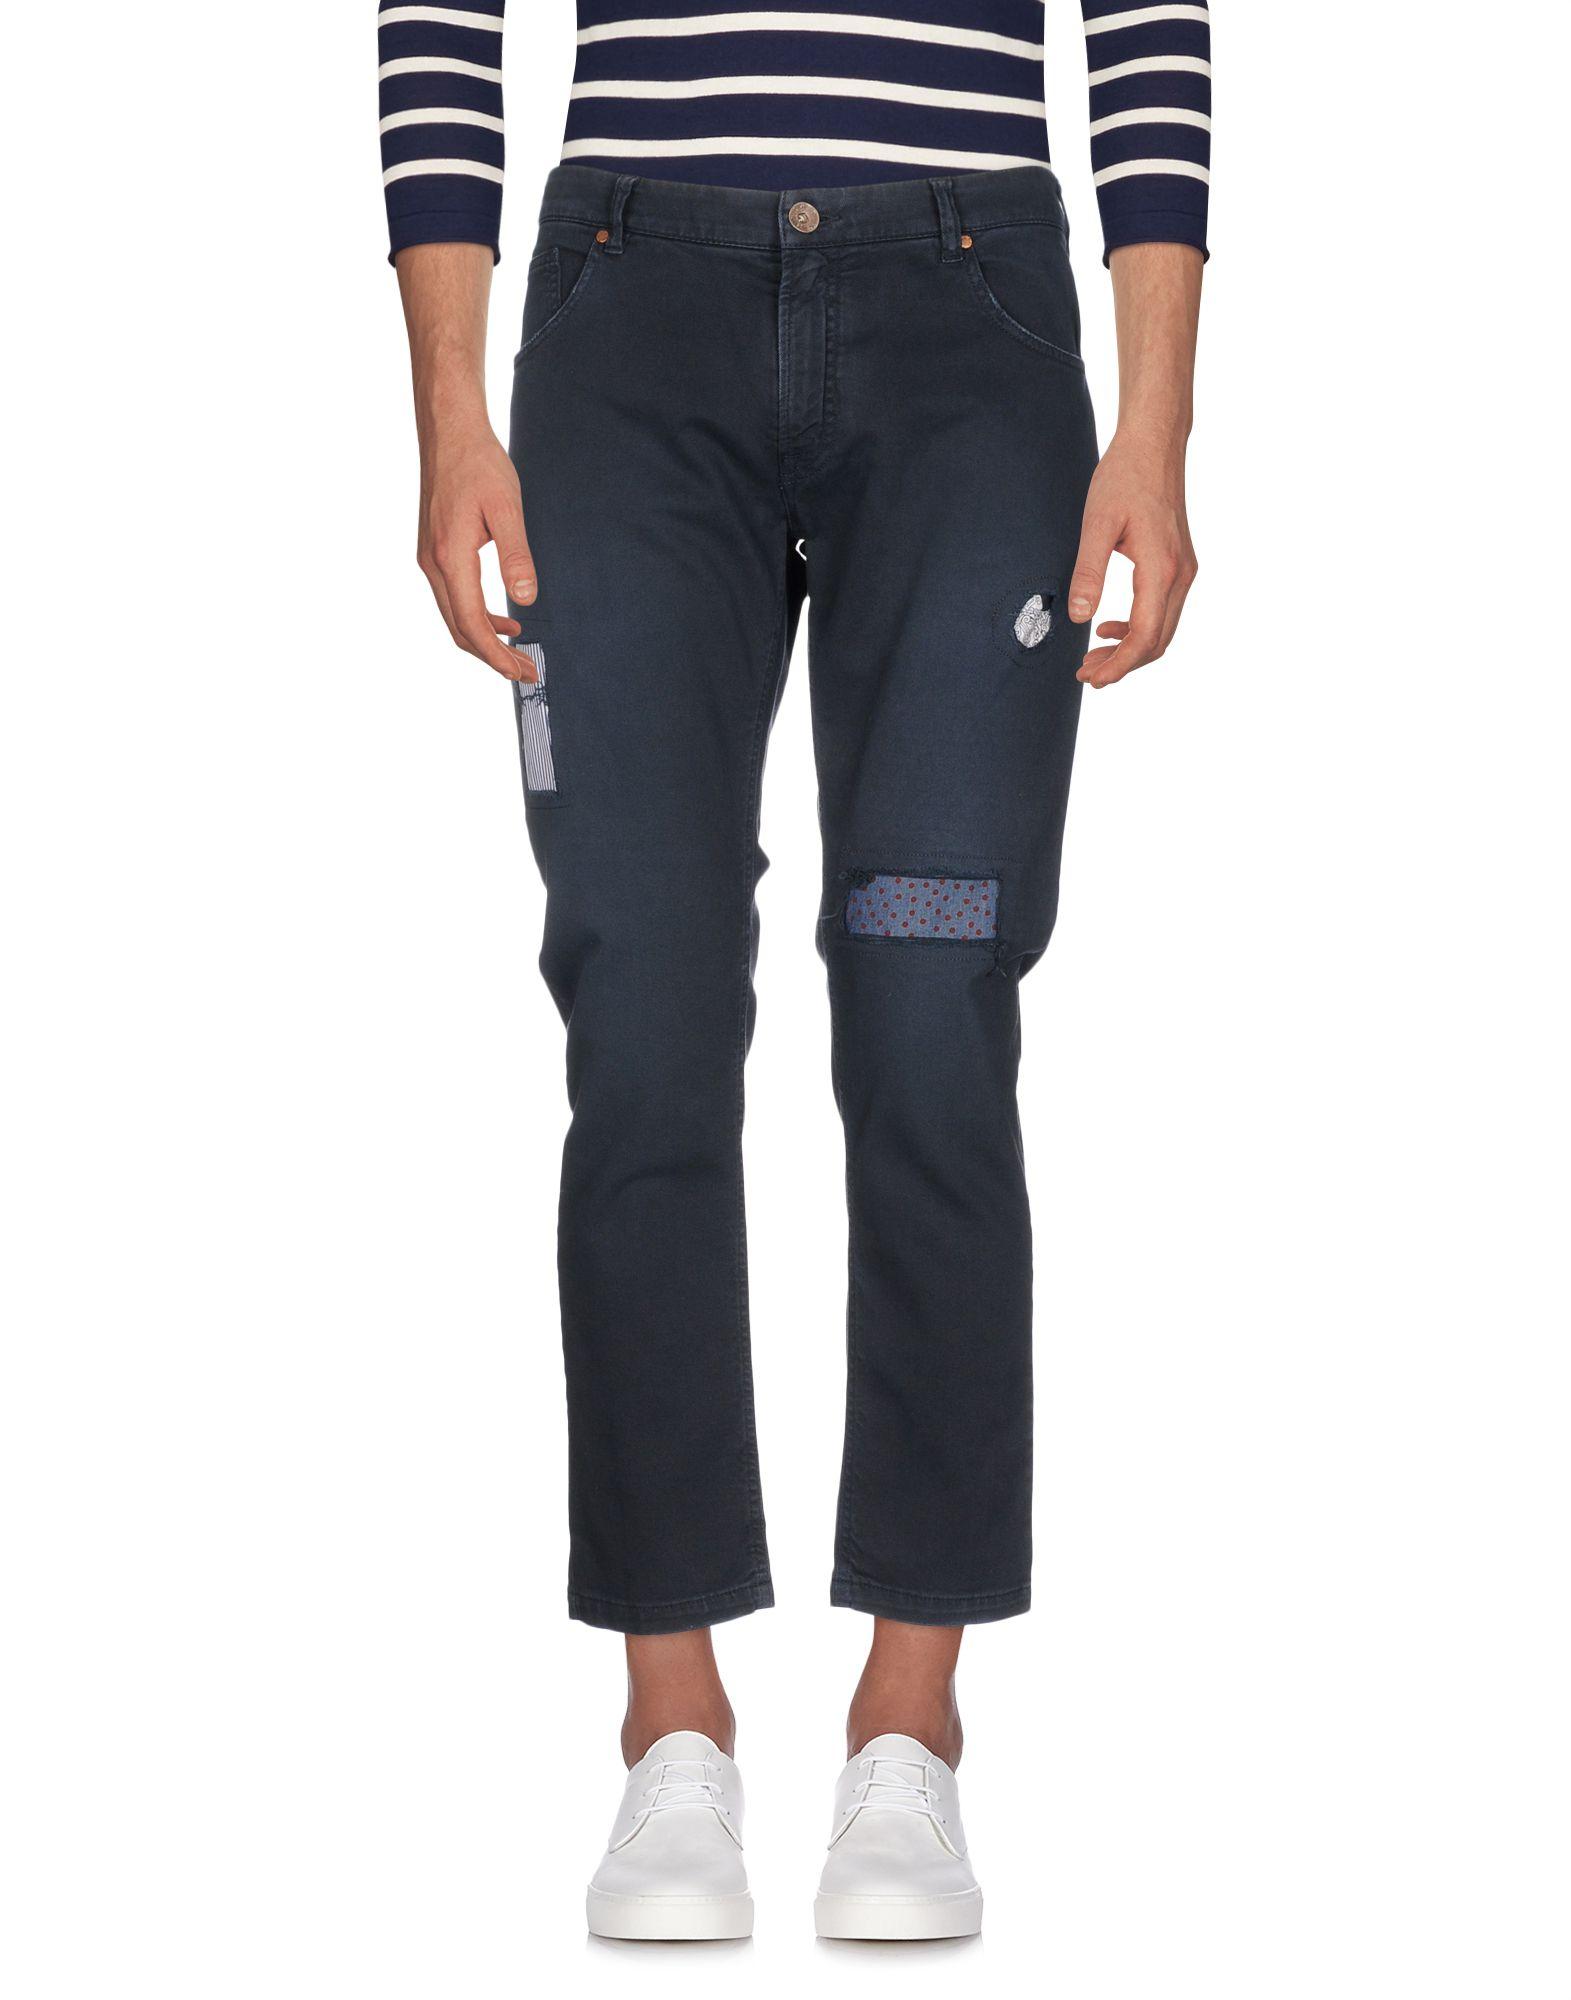 JEORDIE'S Джинсовые брюки-капри